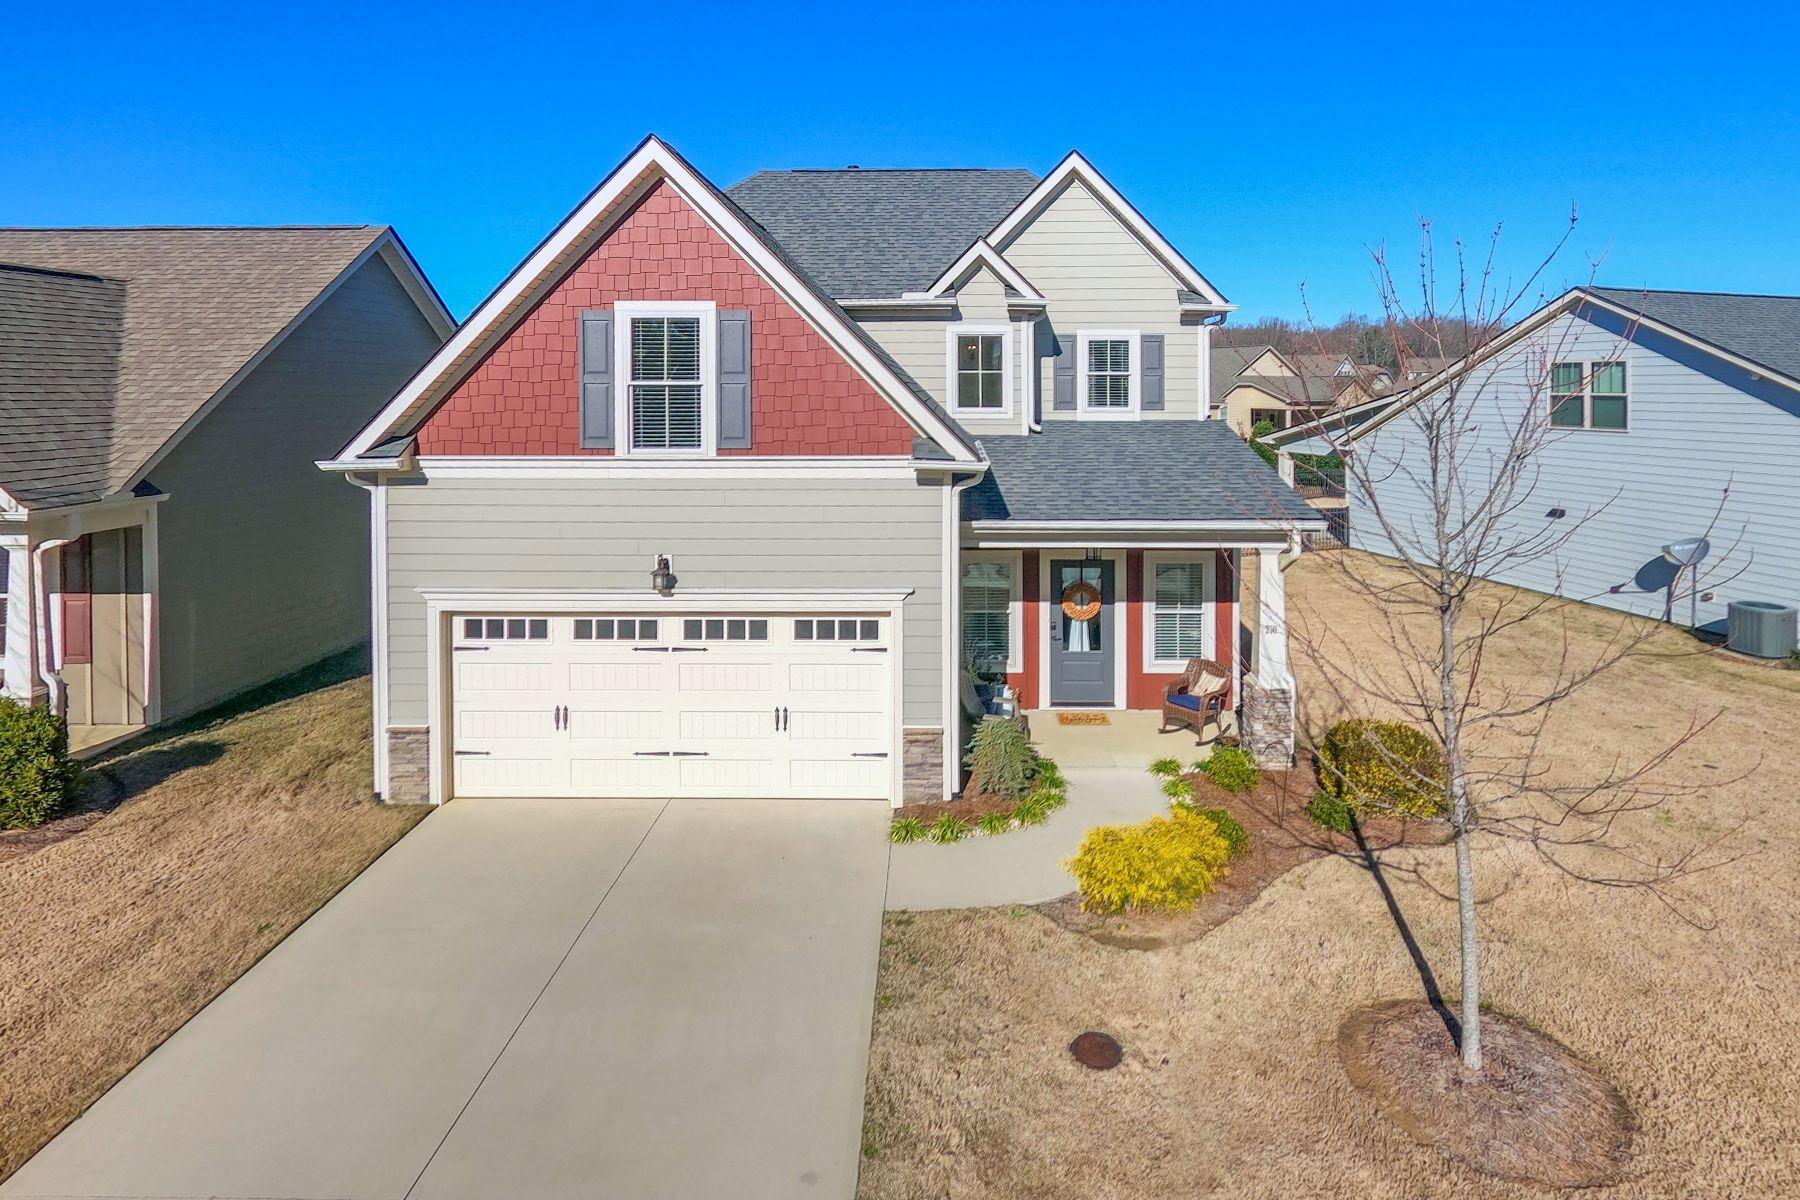 Single Family Homes for Active at 330 Belle Oak Drive, Simpsonville, SC 29680 330 Belle Oak Drive Simpsonville, South Carolina 29680 United States